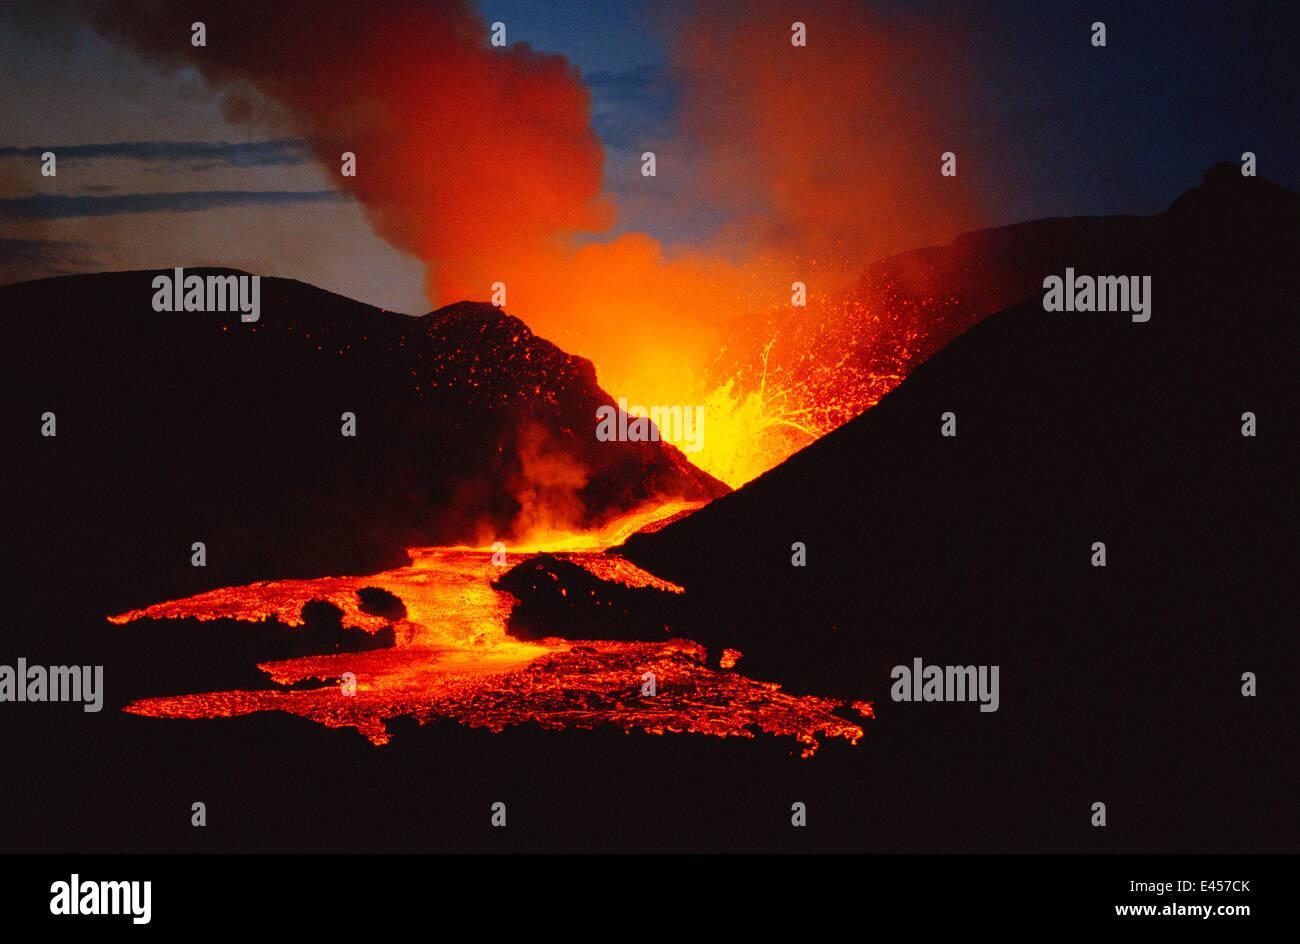 Red hot lava flow from Kimanura volcano eruption, Virunga NP, Dem Rep of Congo 1989 Africa Stock Photo